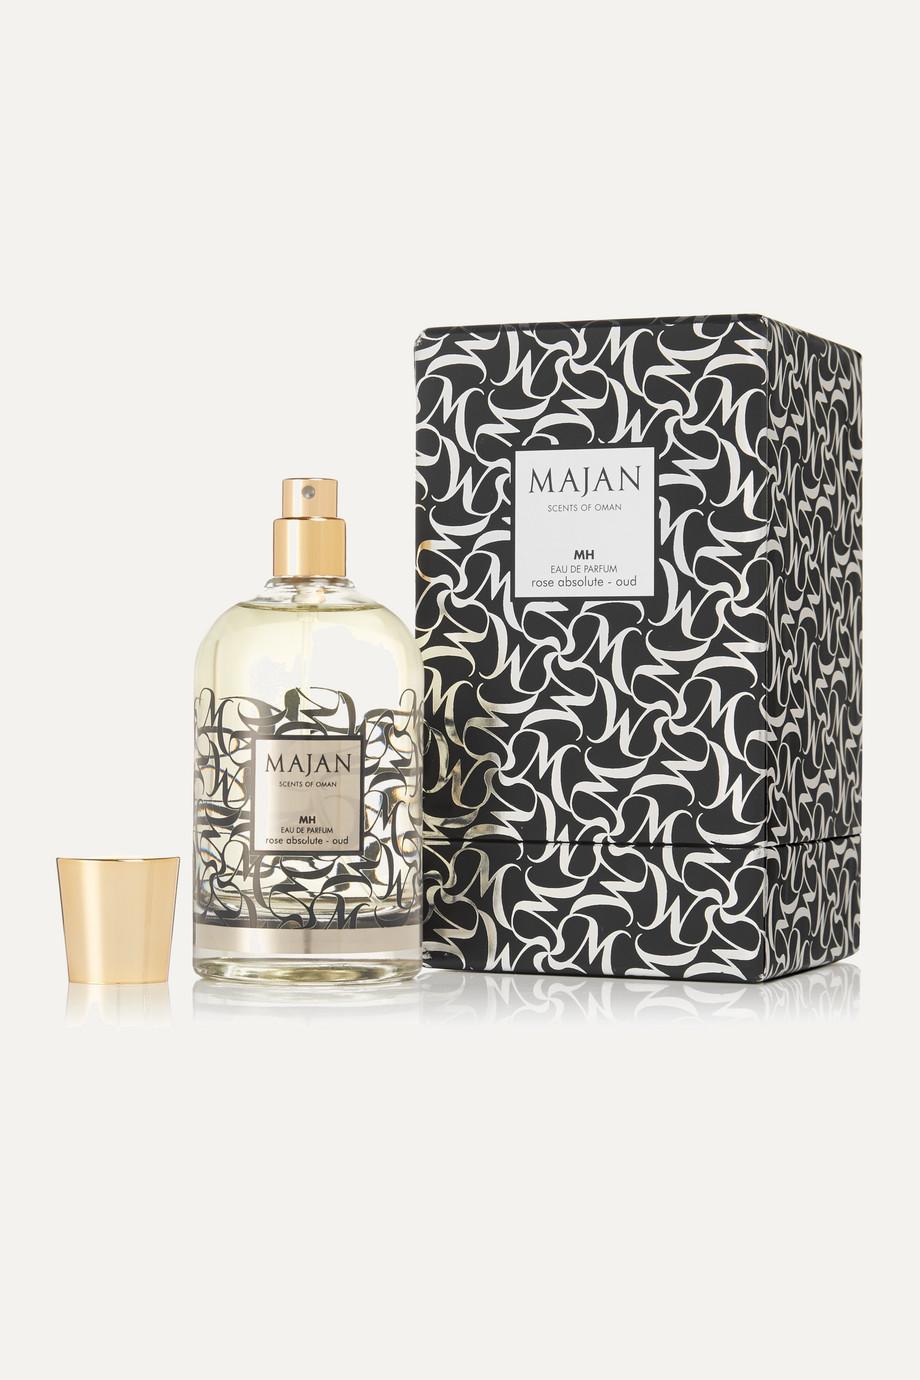 MAJAN MH, 100 ml – Eau de Parfum